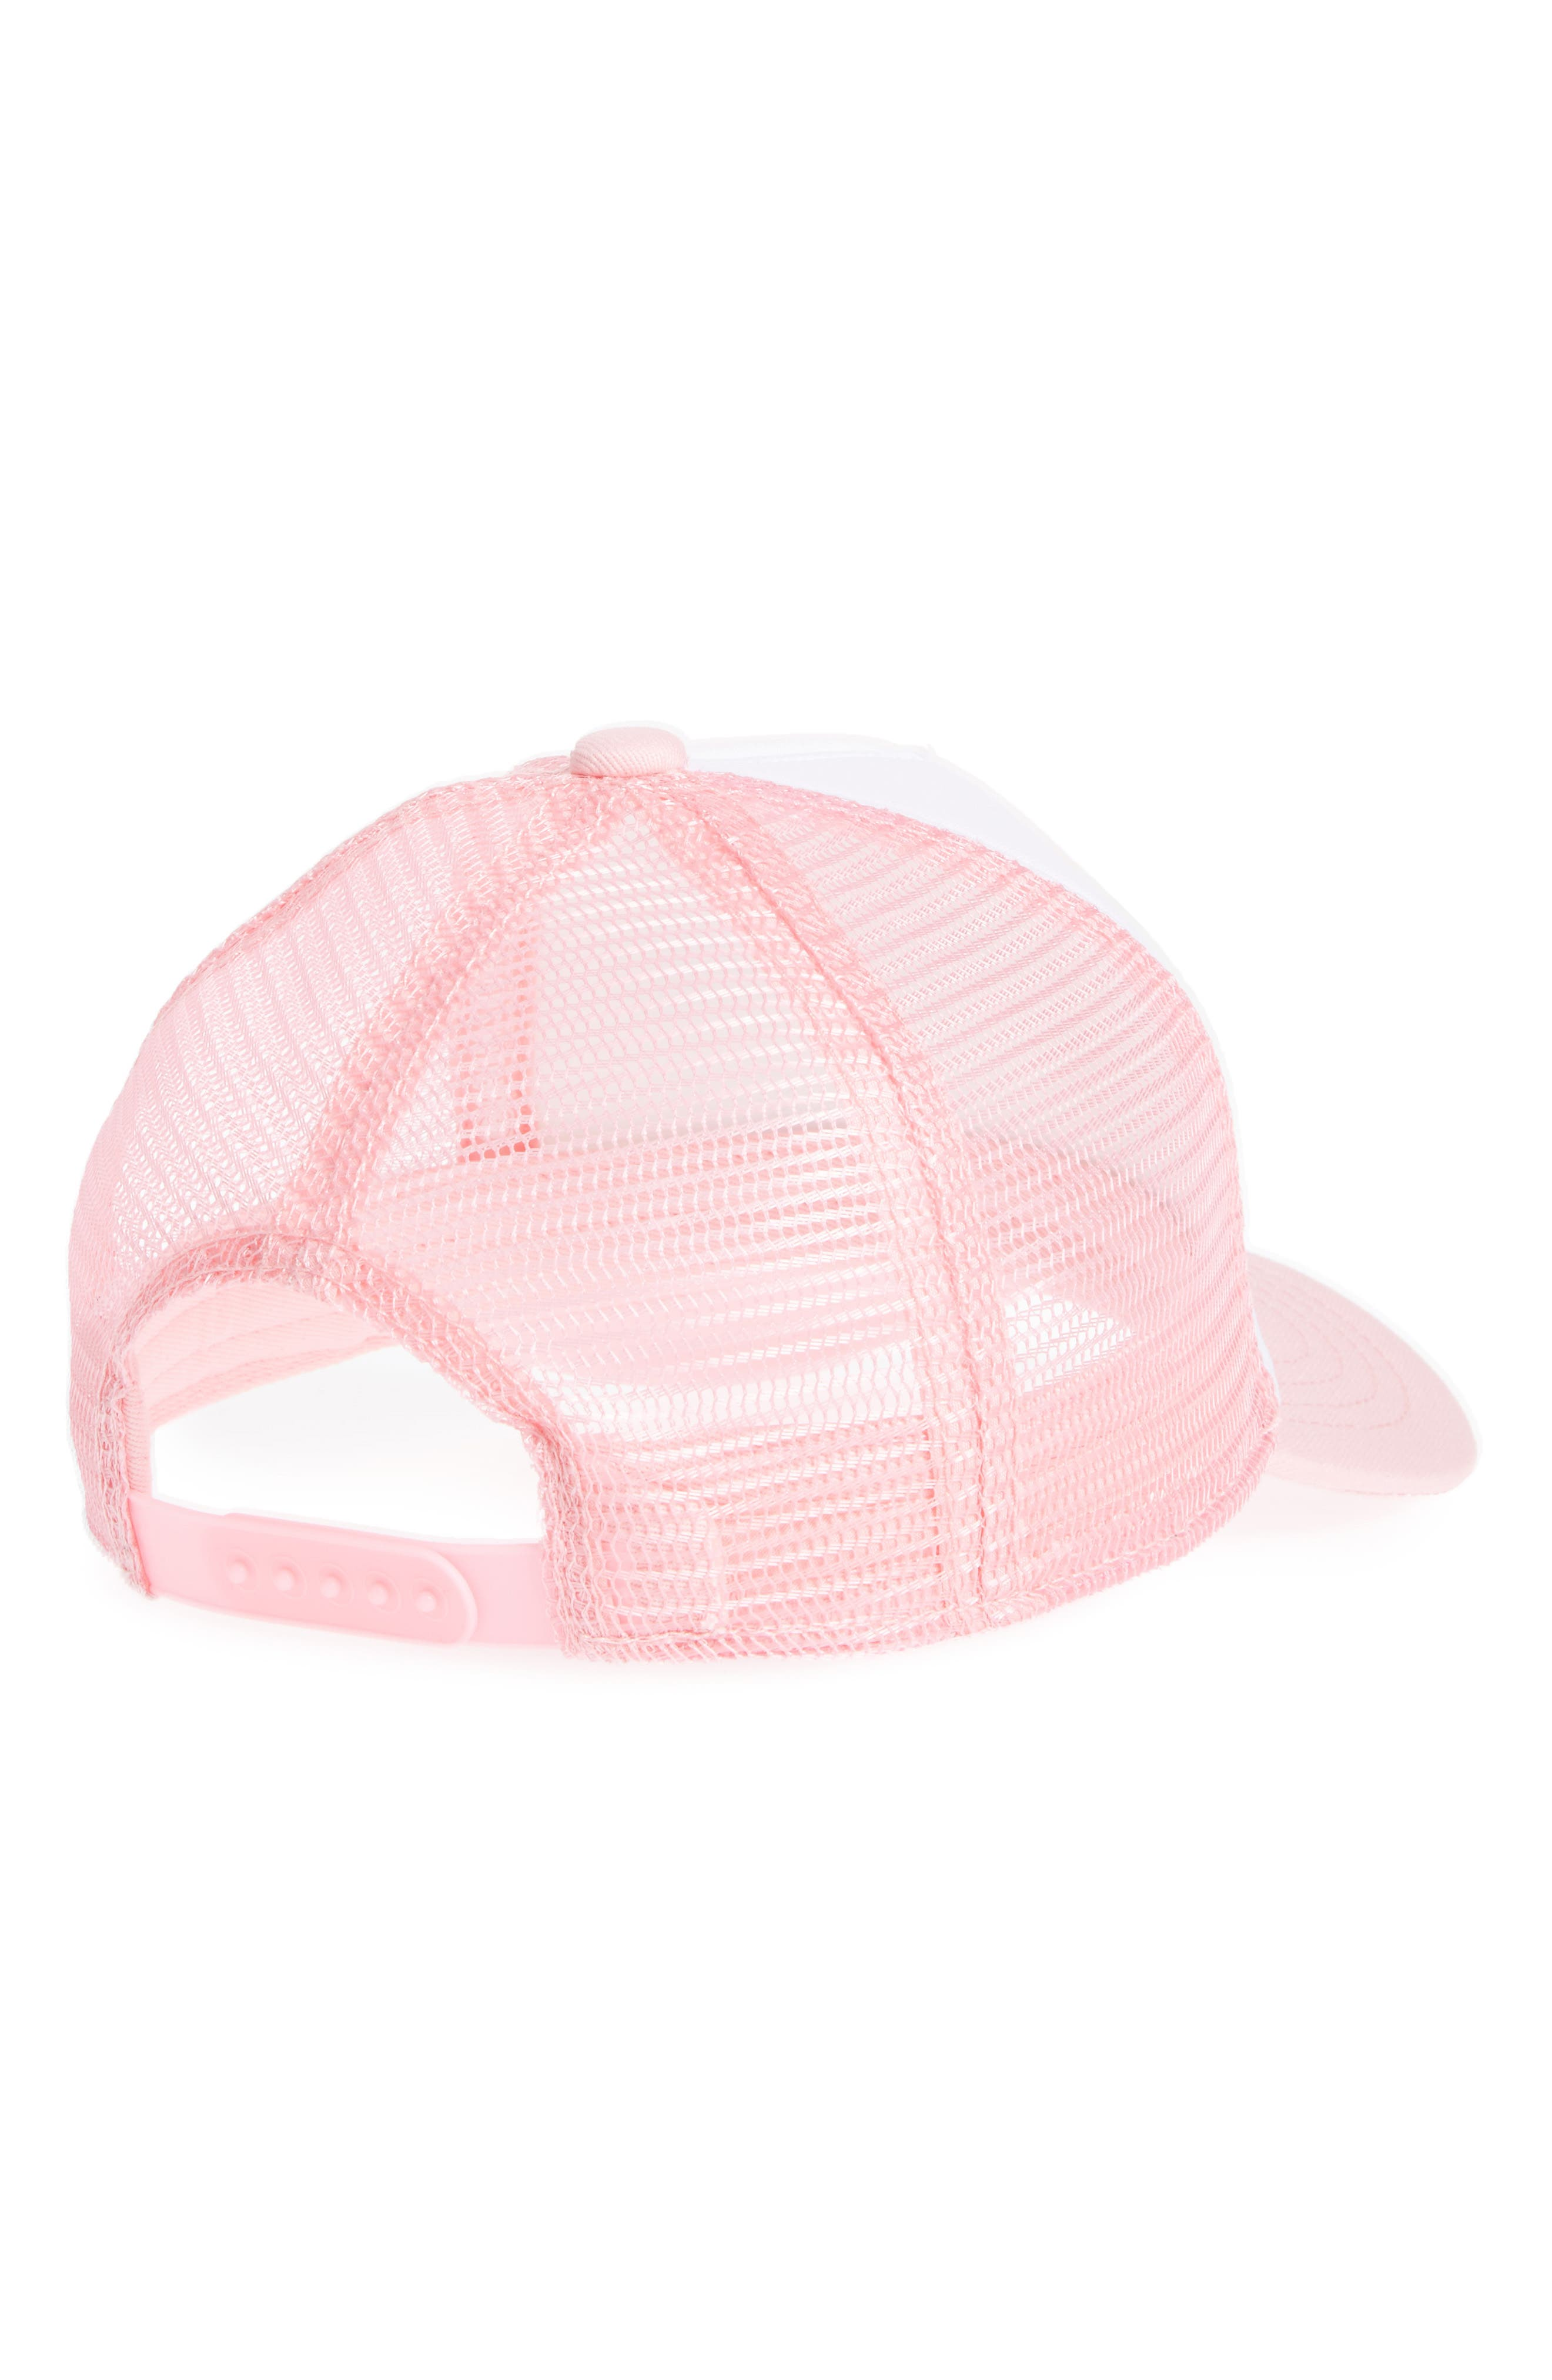 Trucker Hat,                             Alternate thumbnail 2, color,                             MERMAID AT HEART